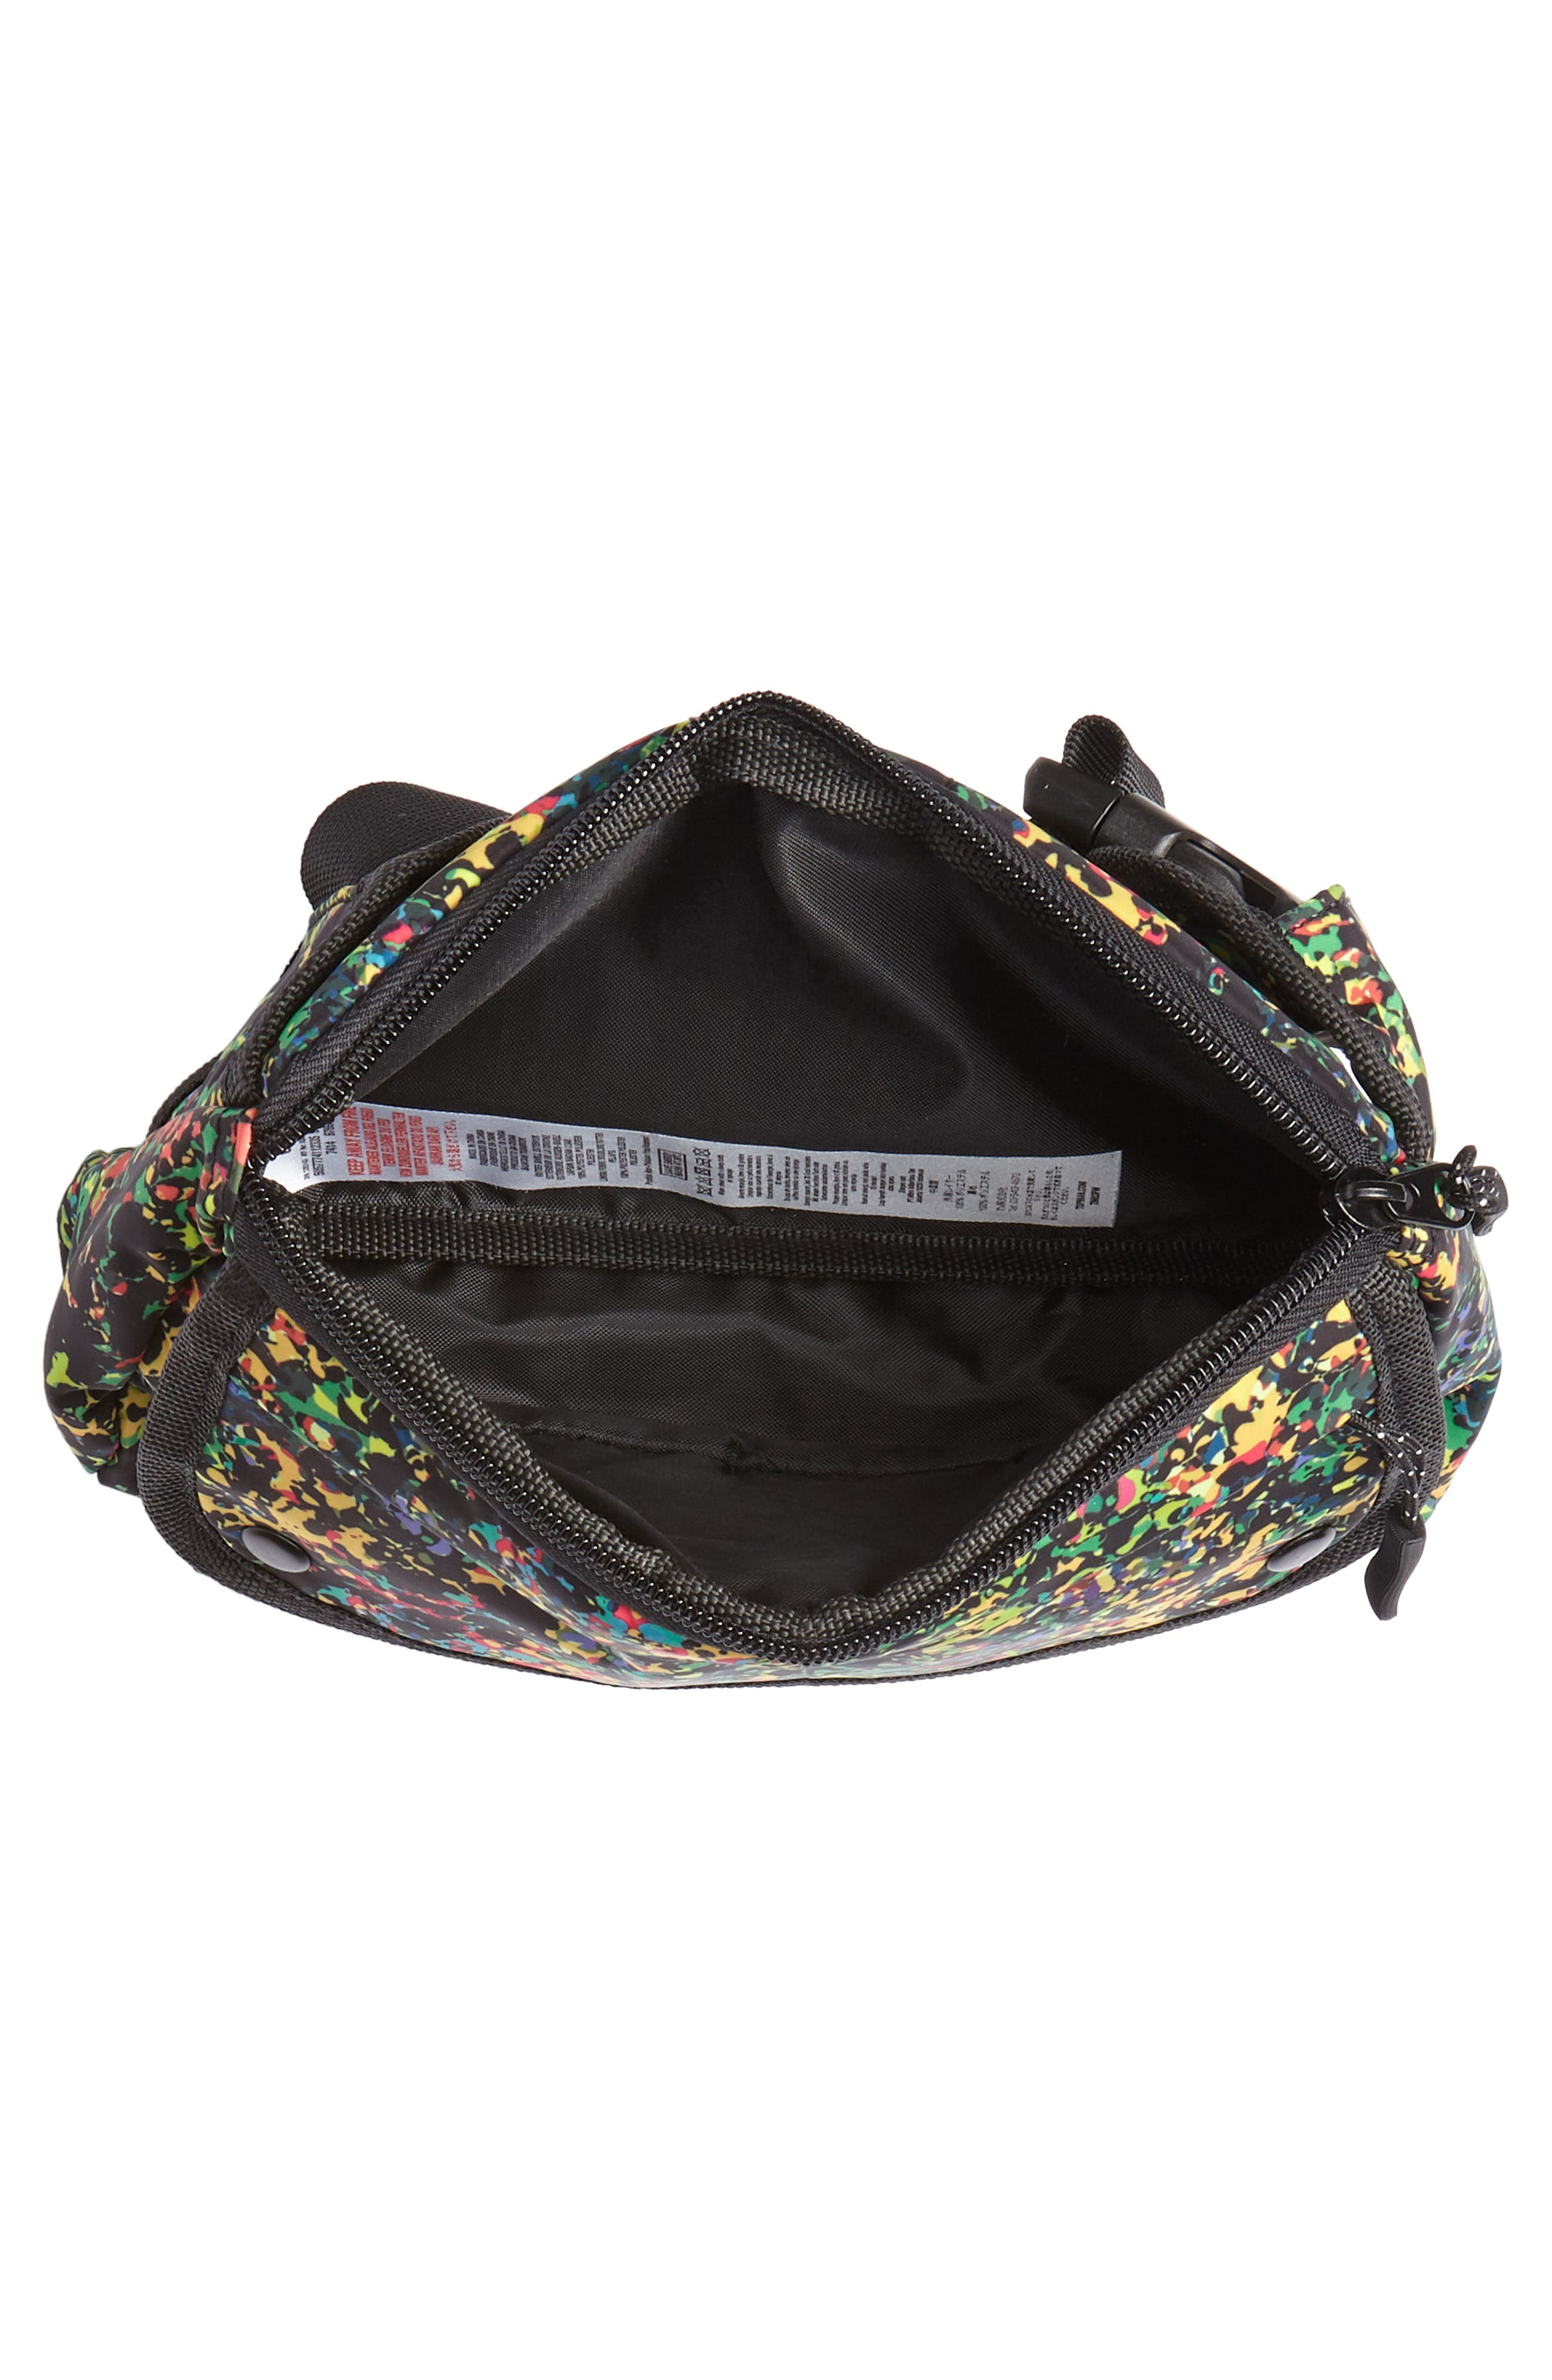 Sabre Crossbody Belt Bag,                             Alternate thumbnail 4, color,                             BLACK MULTI